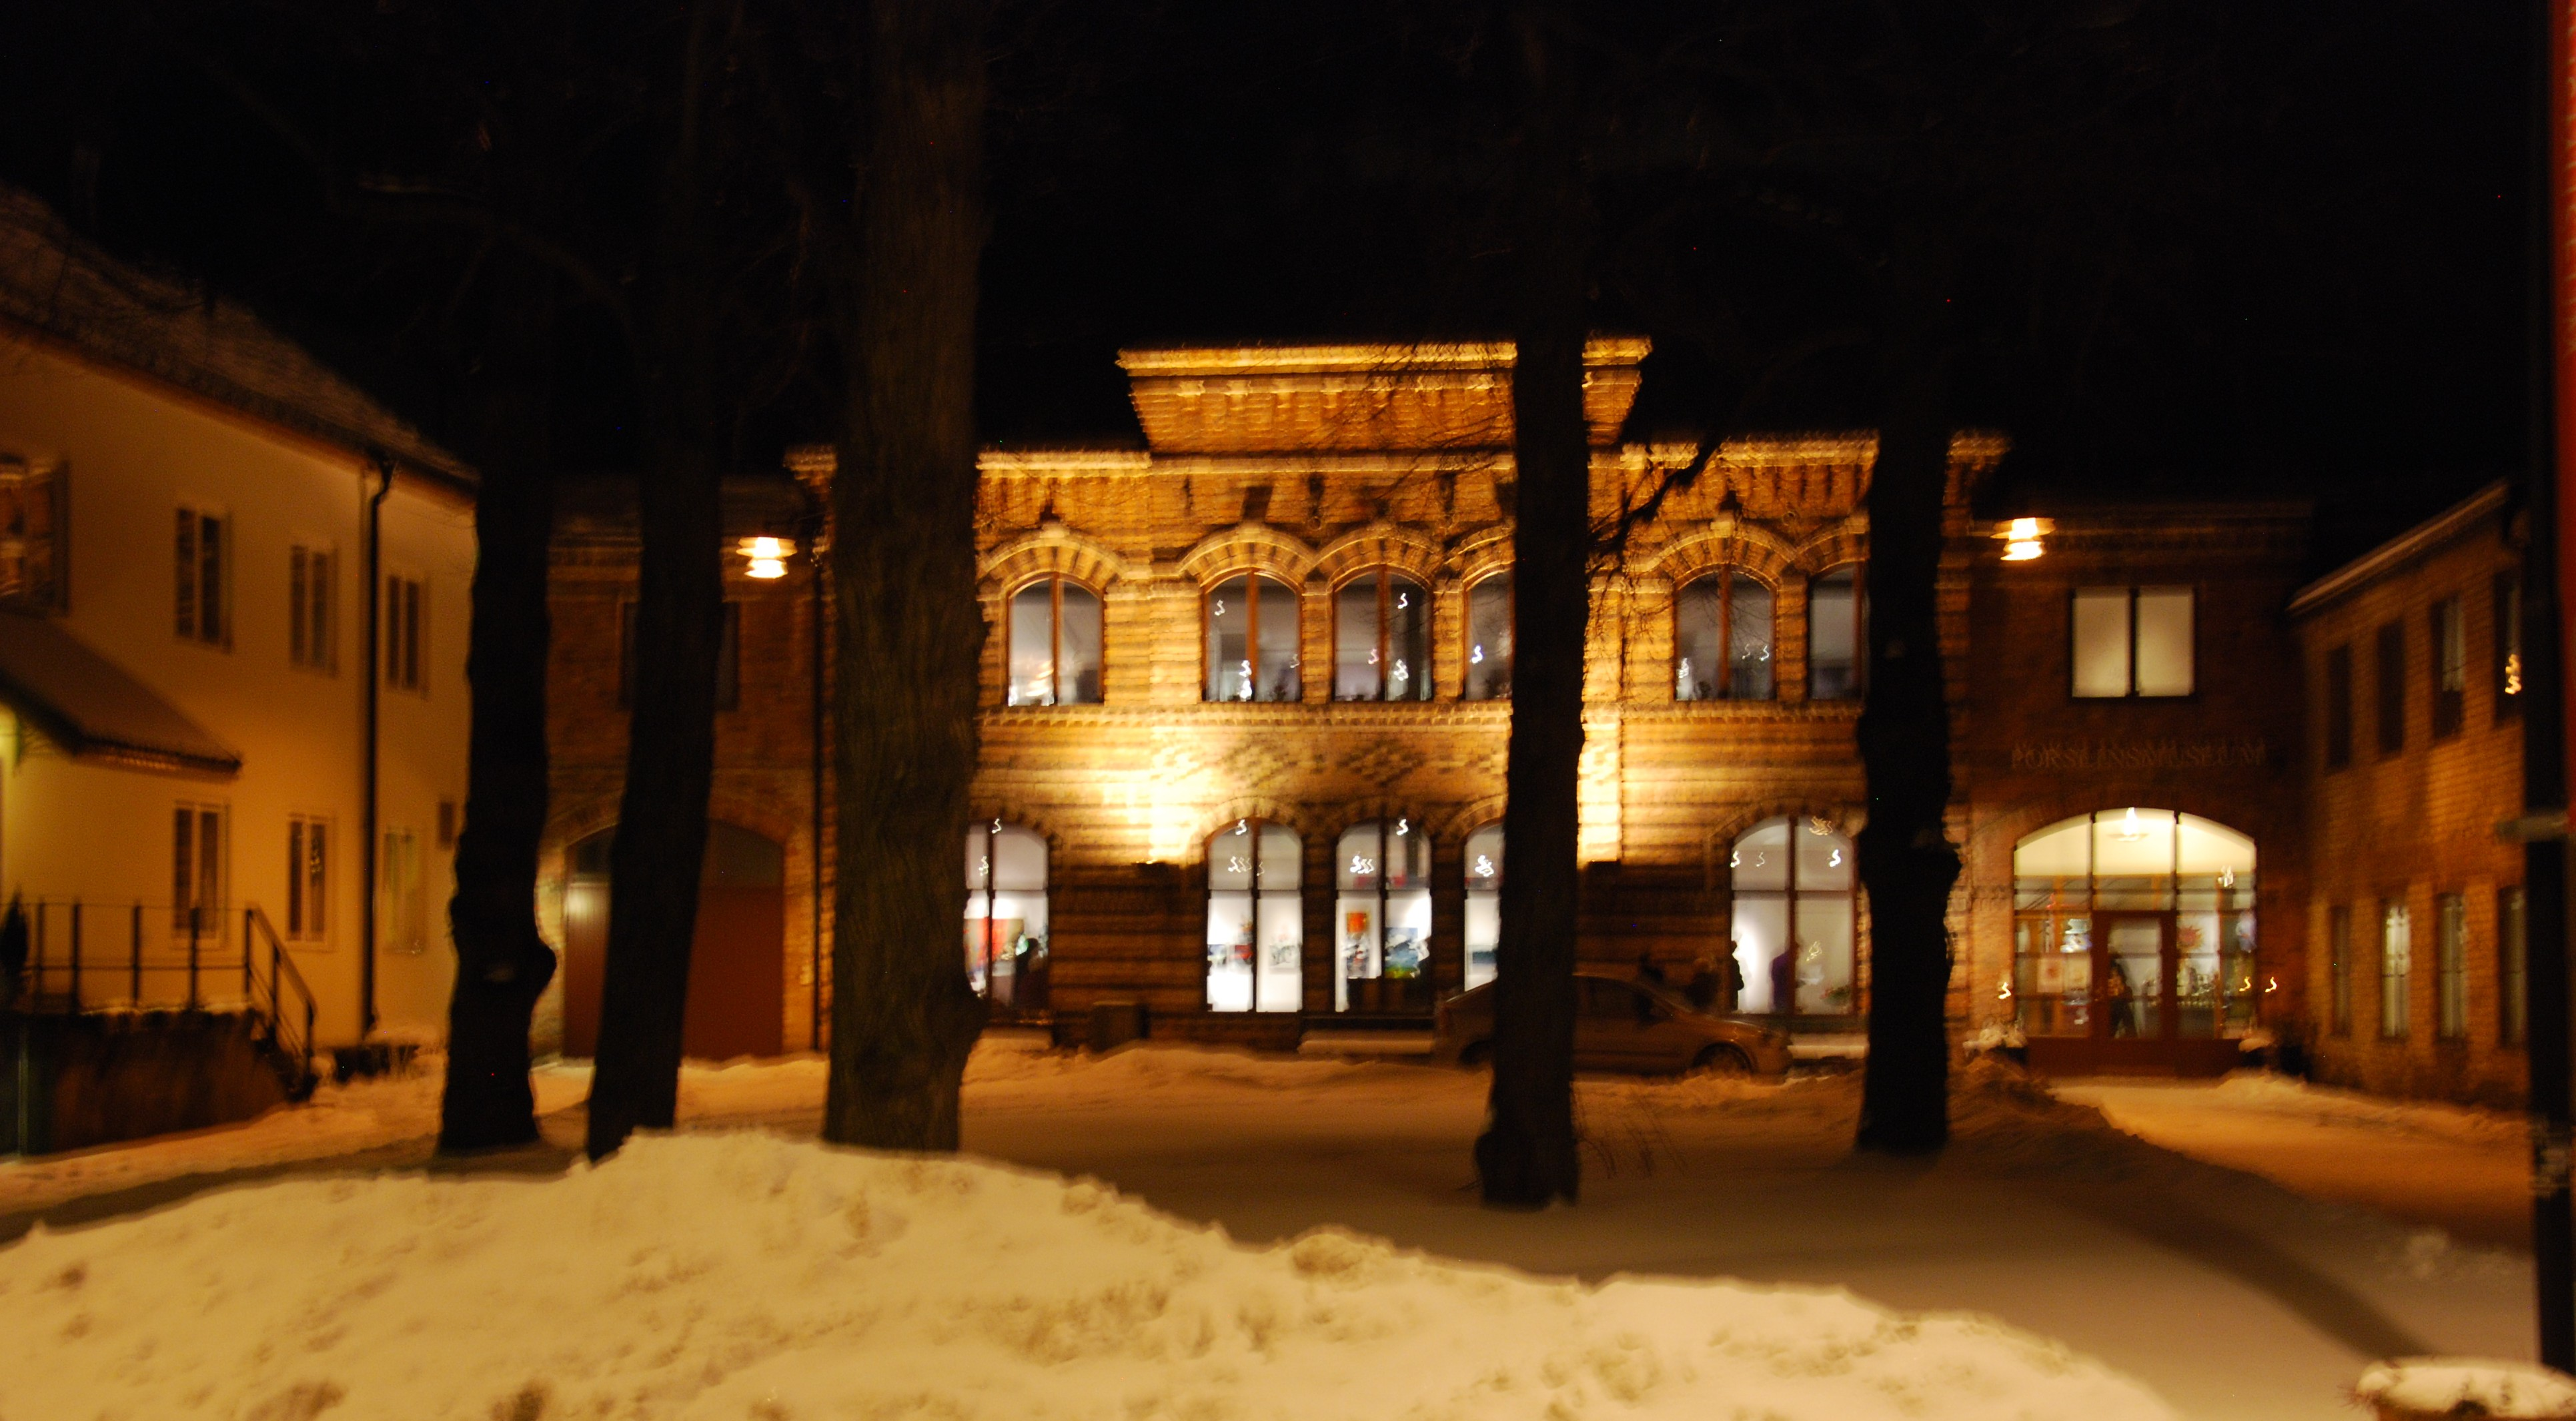 Stig lindberg pa gustavsbergs porslinsmuseum